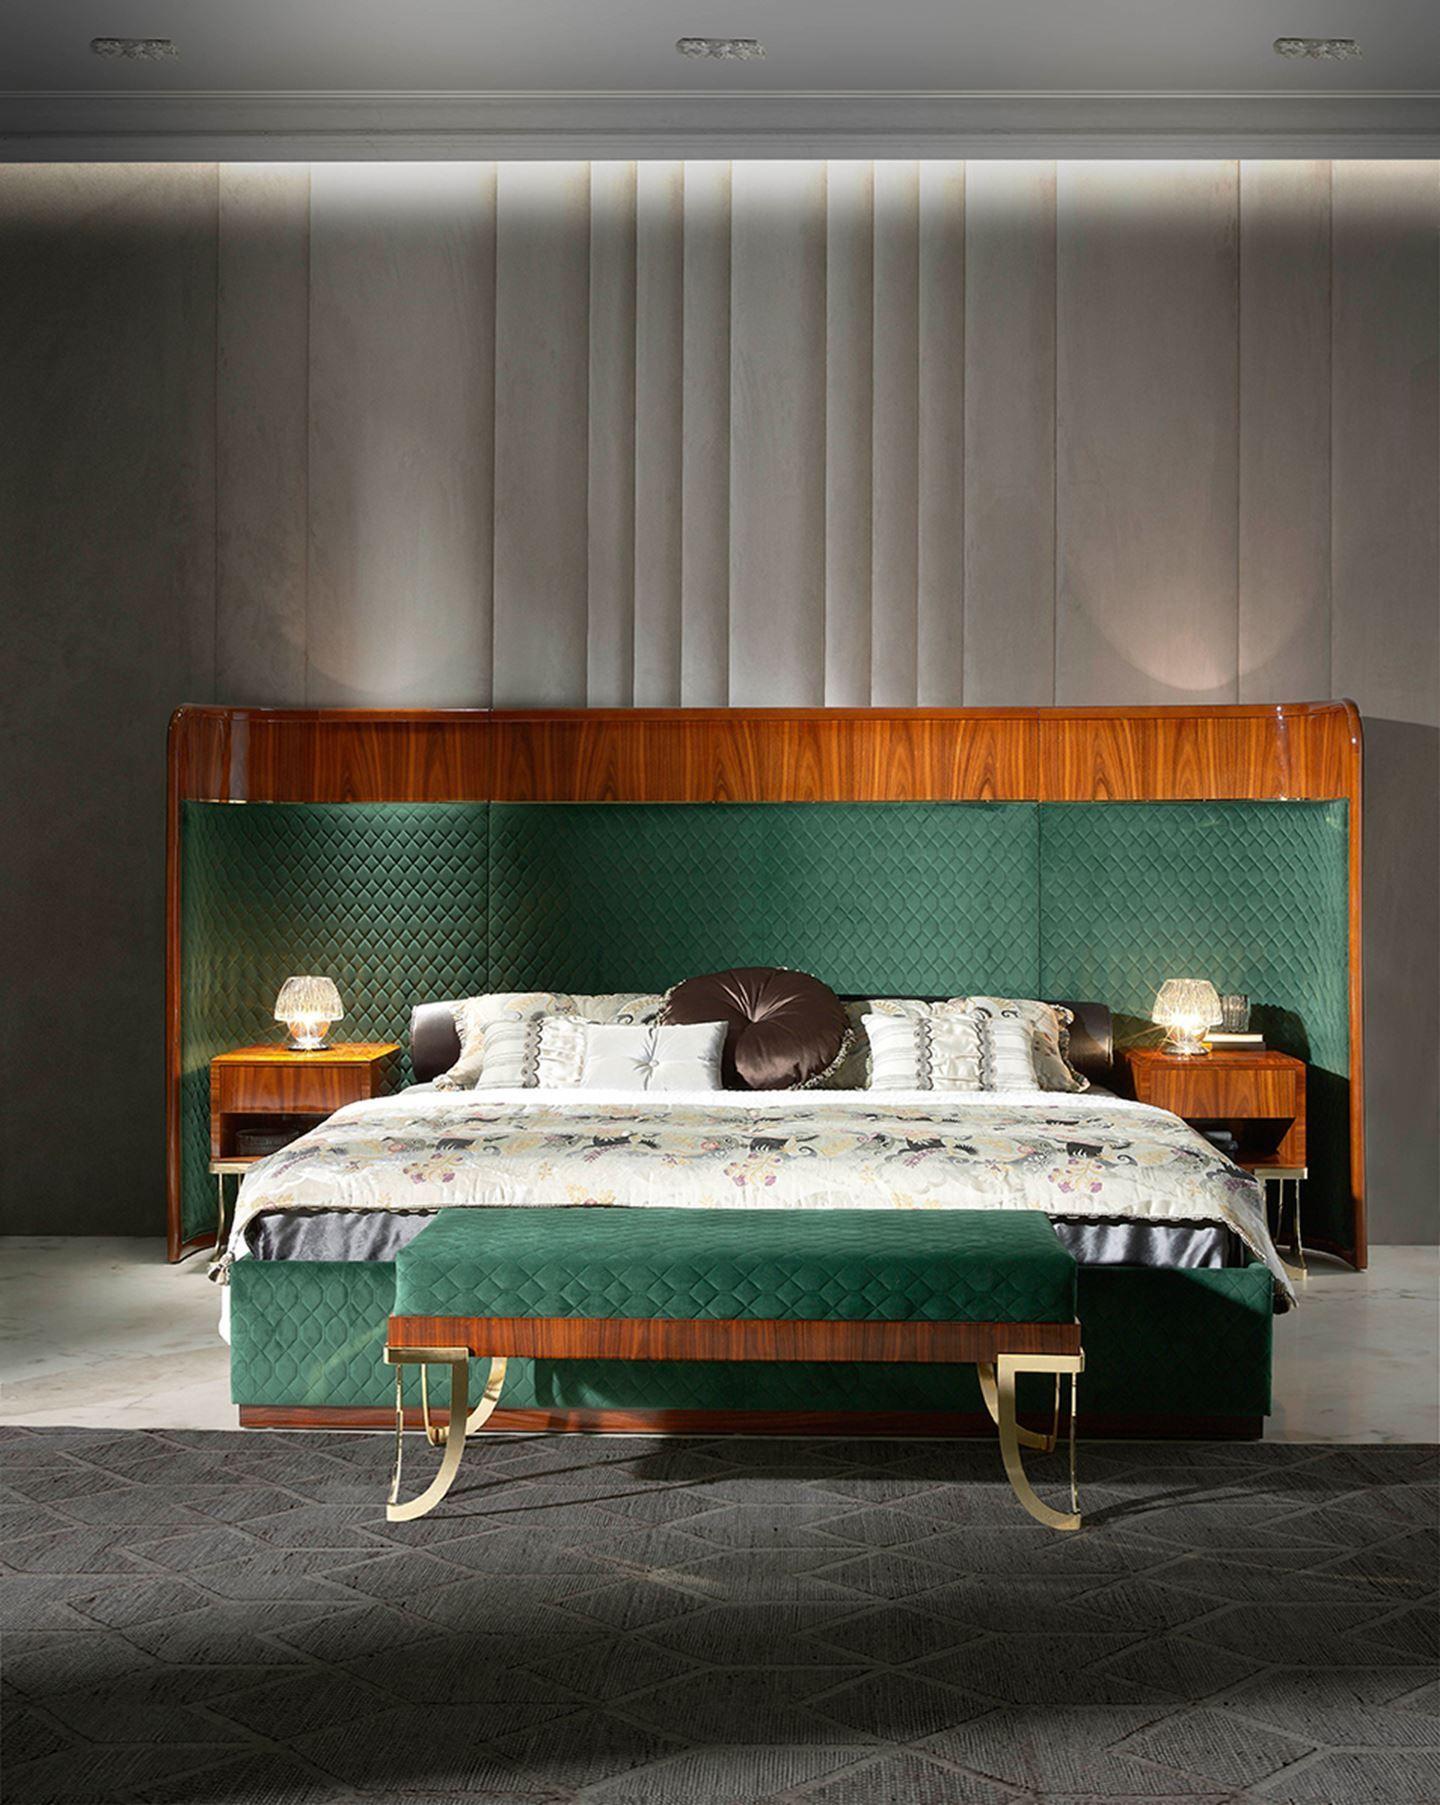 SAVOY bedroom - SOHER www.soher.com  #furniture #bedroom #bedroomdecor  #bedroomideas #bedroomdesign #bed #interiordesign #interiordesignideas #interiores #homedecor #homedecorideas #home #luxury #luxuryfurniture #luxurylifestyle #luxuryhomes